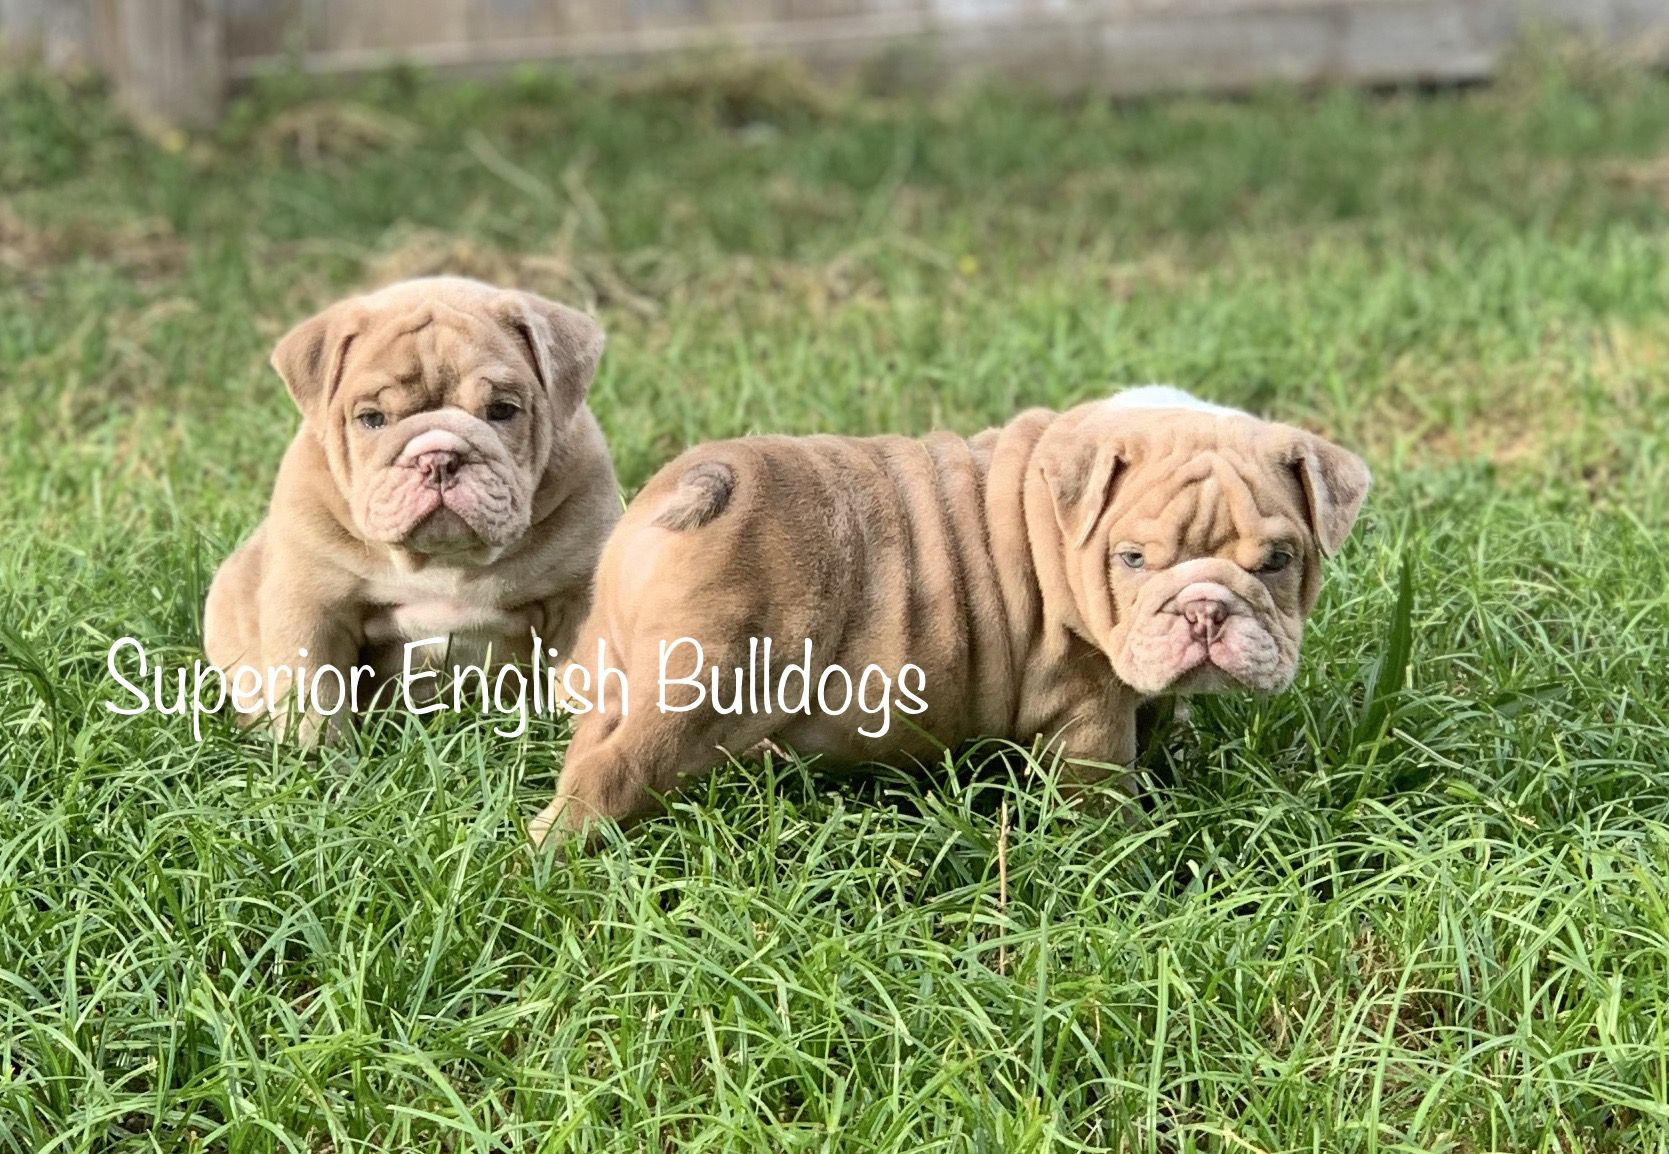 English Bulldogs image by Superior English Bulldogs